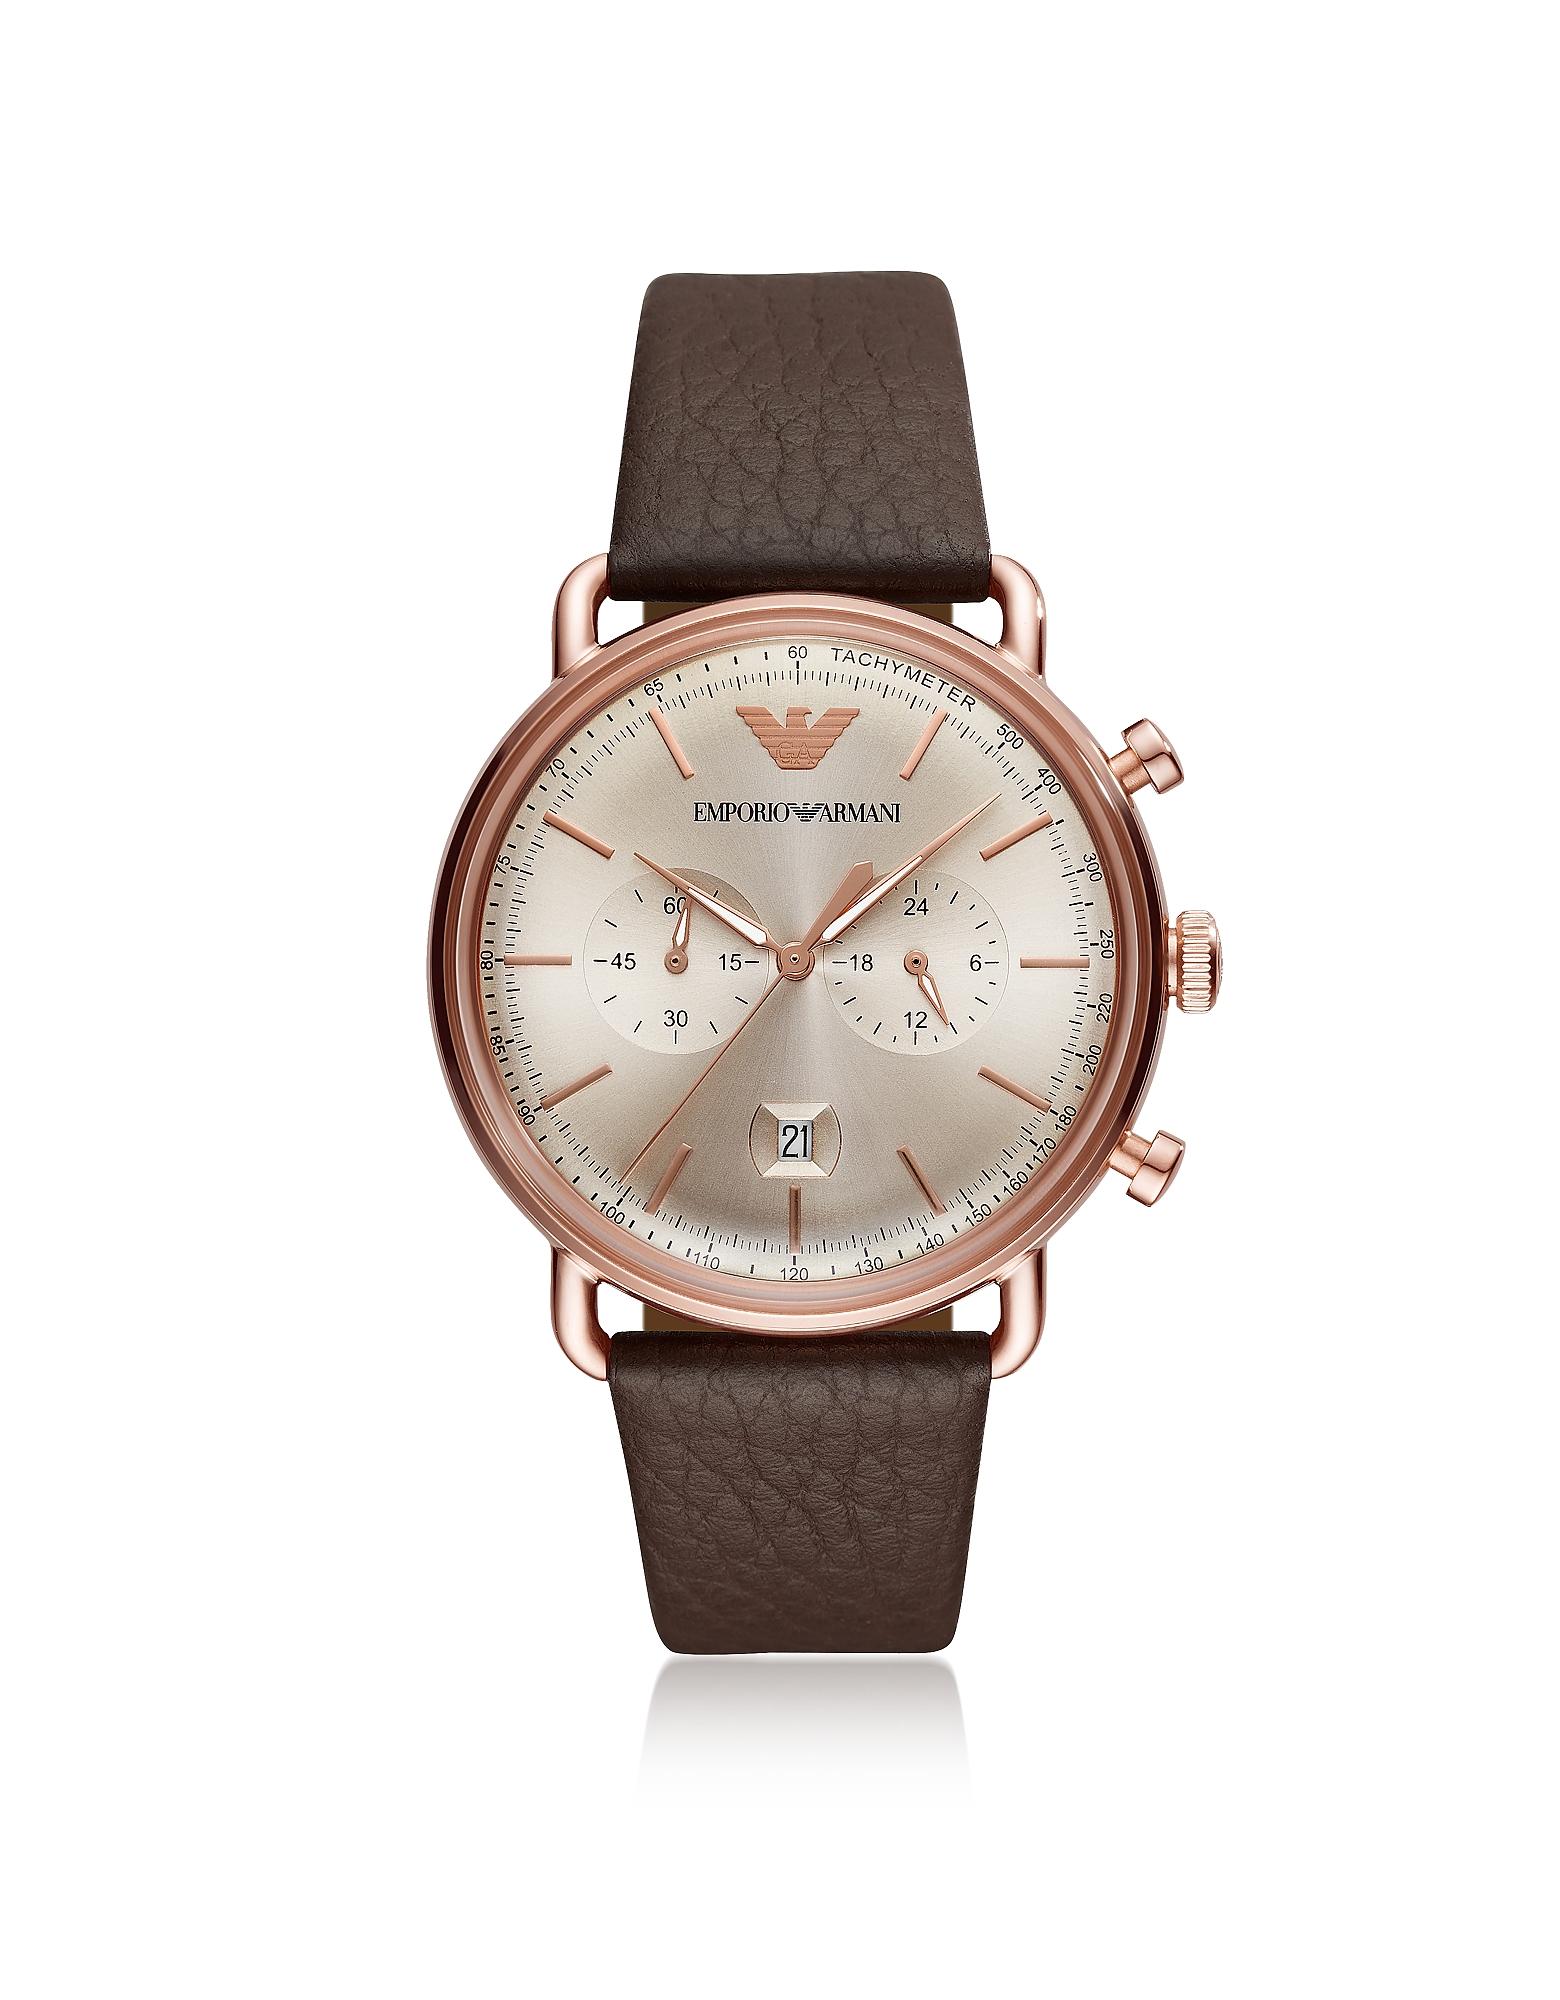 Emporio Armani Men's Watches, Emporio Armani Men's Dress Watch